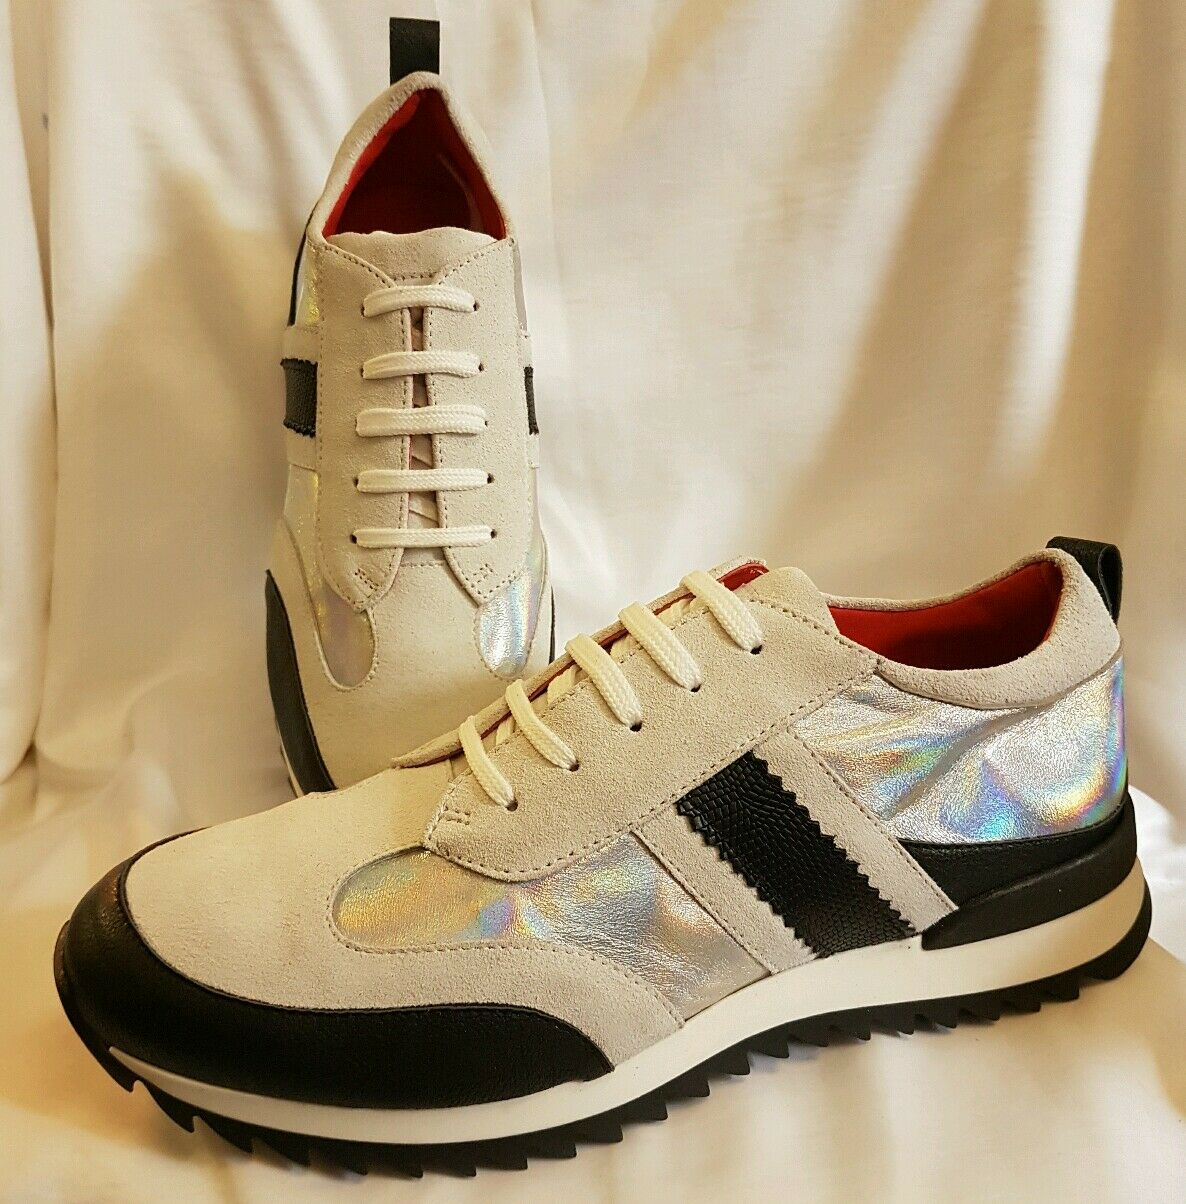 Schuhe Herren Sneaker Turnschuhe Grau silber Gr 43 Made in Italy